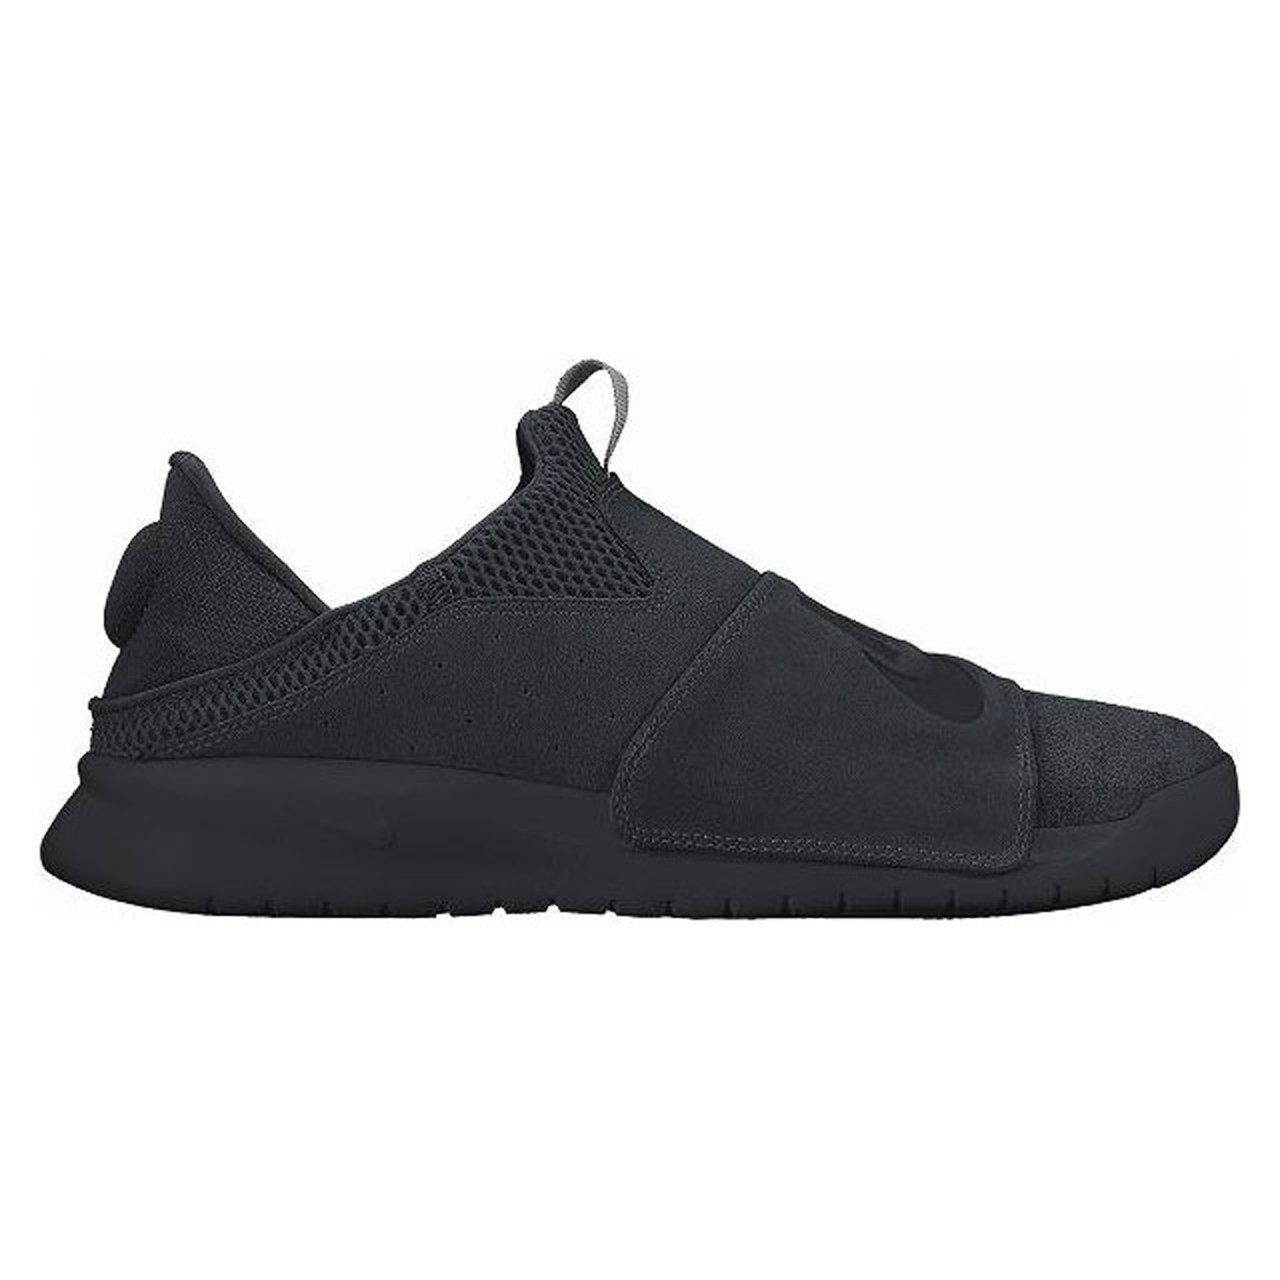 92a5c83b4 Galleon - Nike Benassi Slip Mens Casual Shoes (13 D(M) US) Black Black-Black